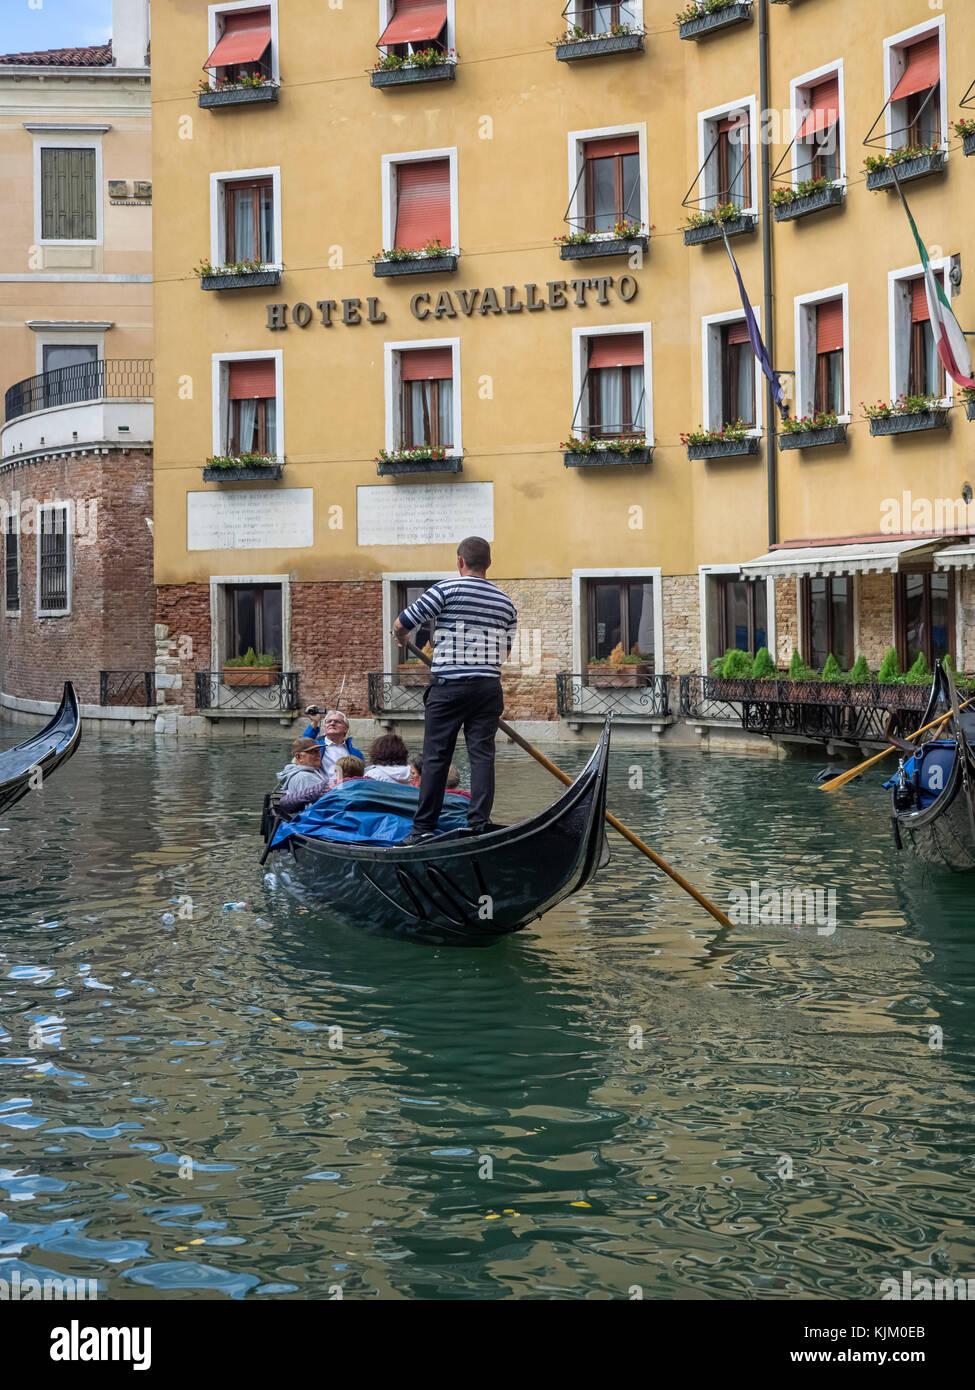 VENICE, ITALY:  Gondola in front of the Hotel Cavalletto facing Bacino Orseolo. - Stock Image